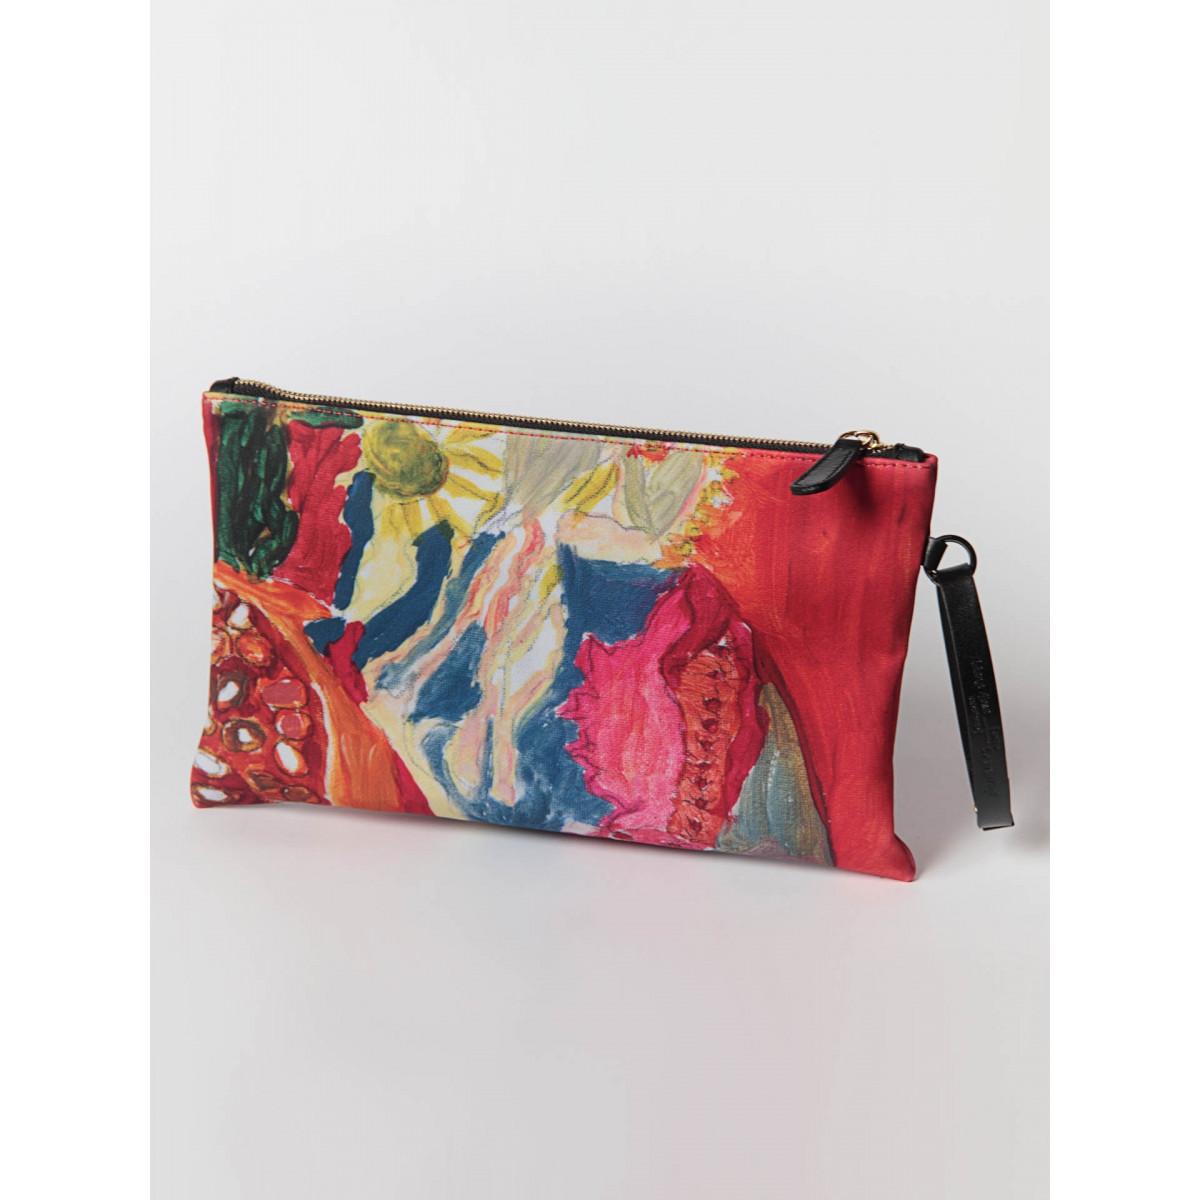 a0a7906d40900 Atomi Clutch Bag - Couturearte di Tiziana Musa e Eugenia Papa